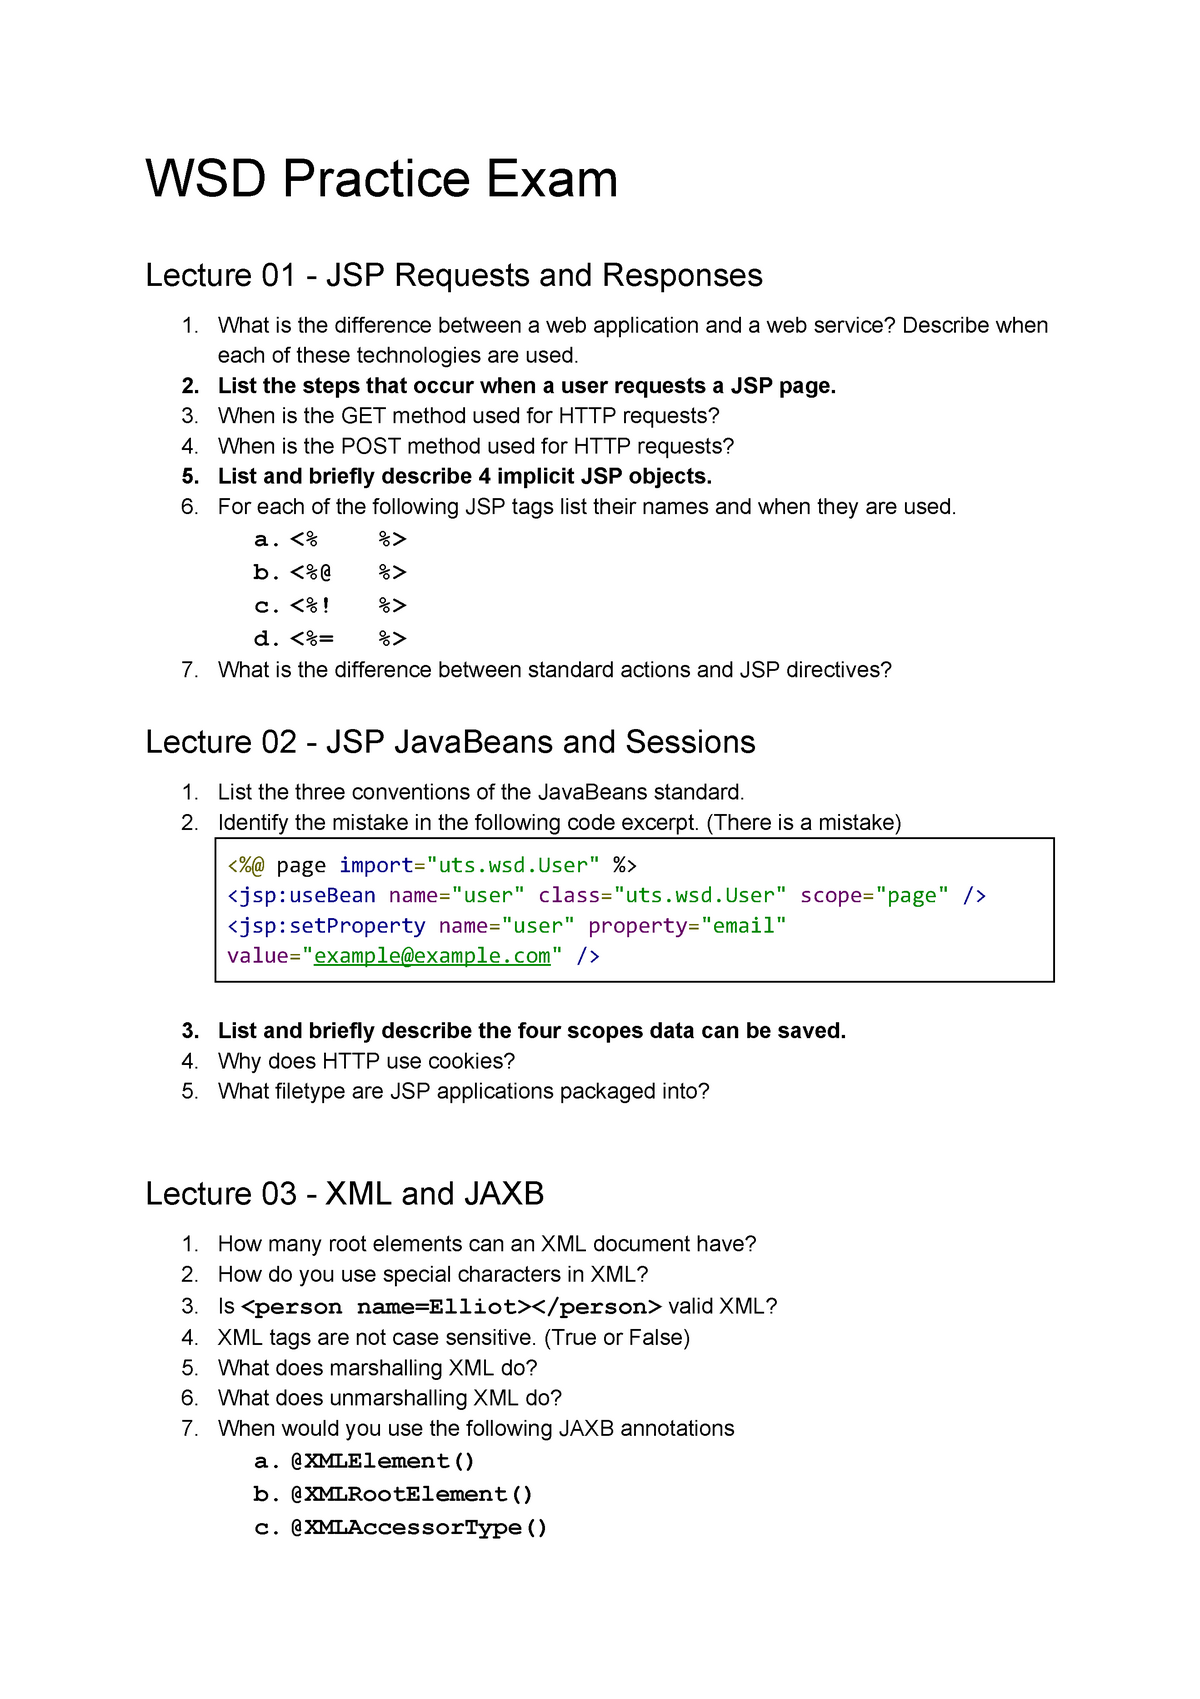 Exam 2016 - 031284 : Web Services Development - StuDocu